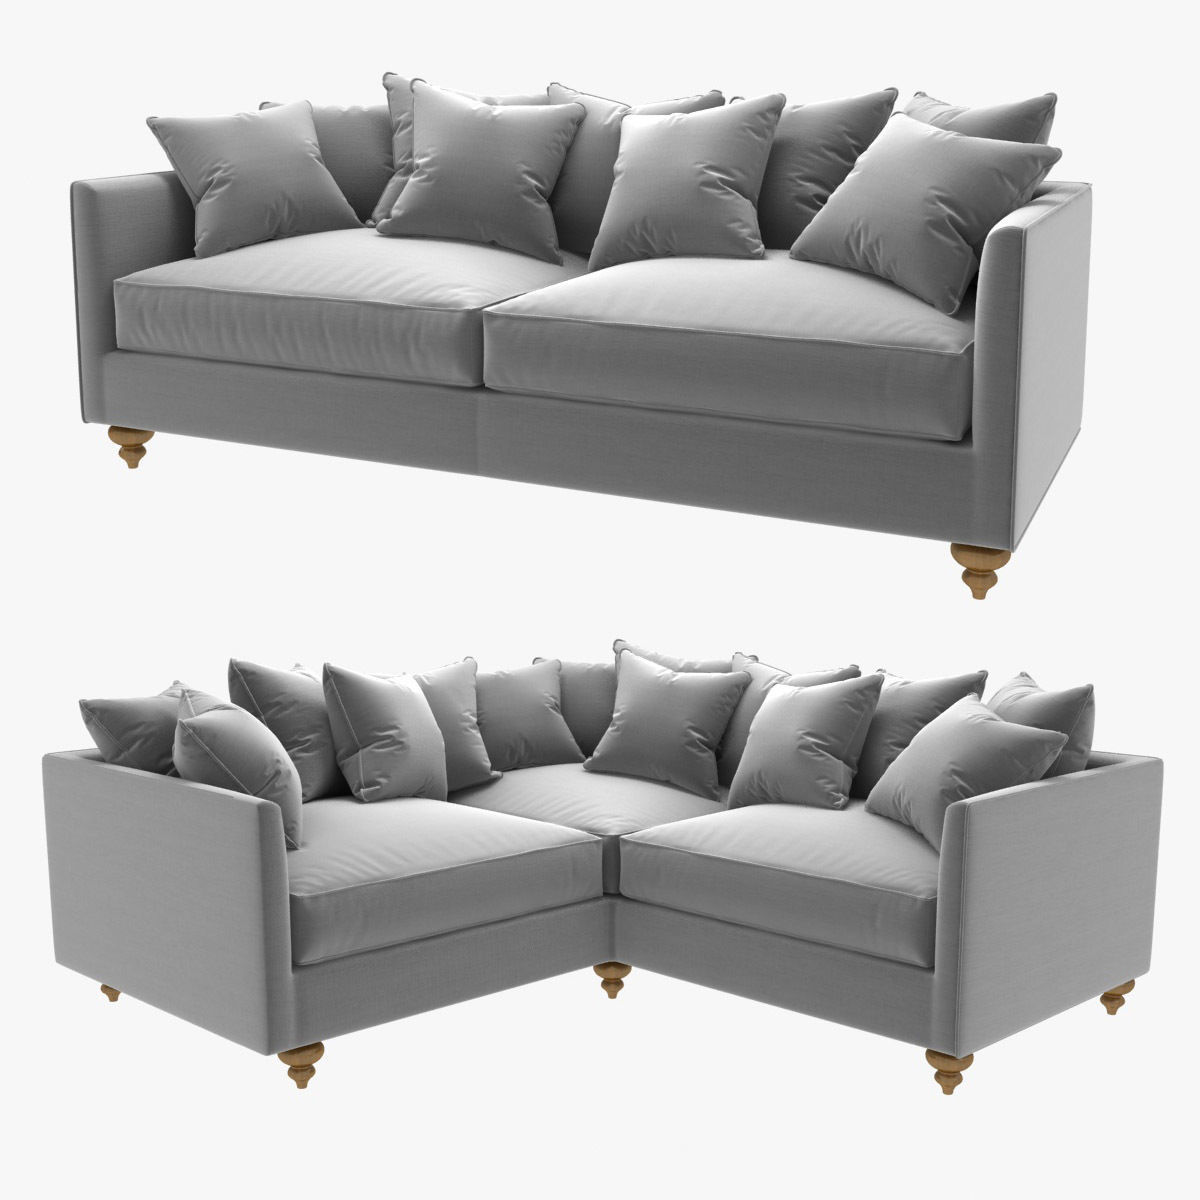 Custom Made Straight And Corner Sofas